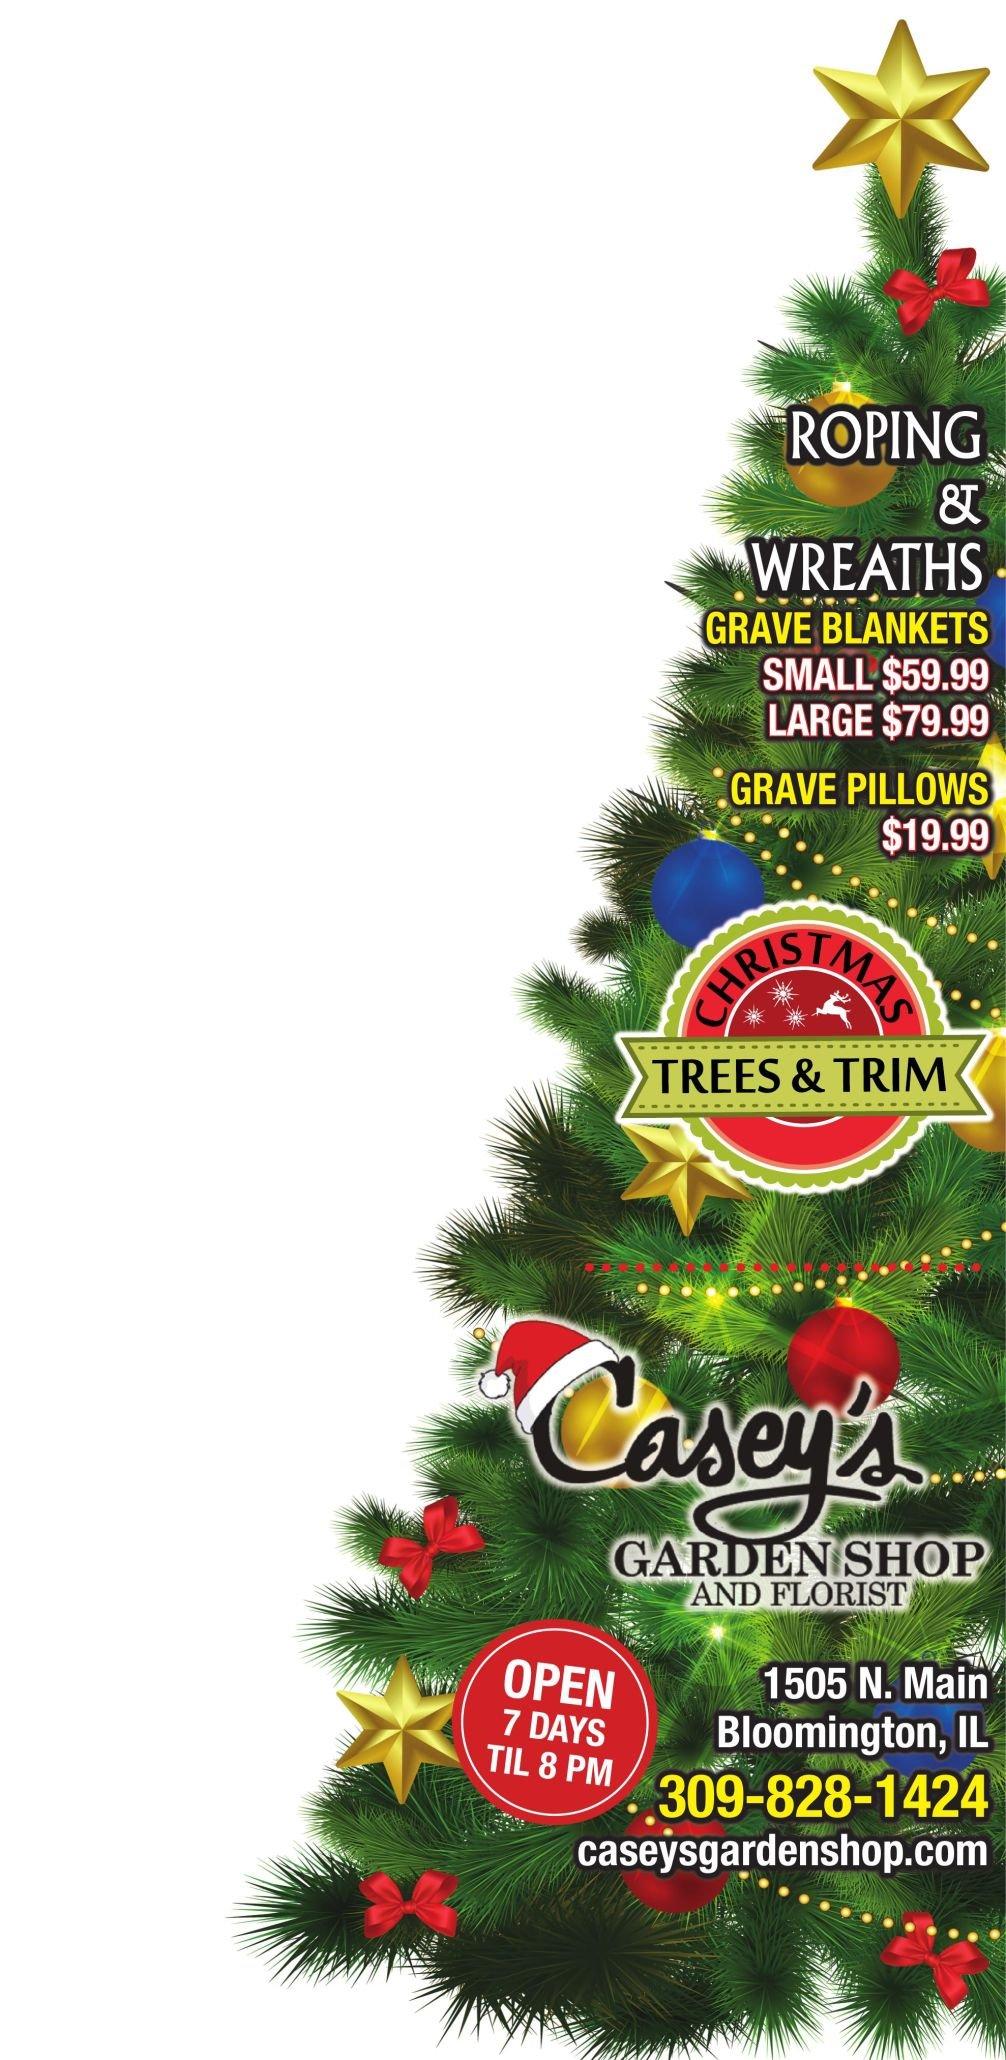 Caseys Garden - Creative Shape Christmas Tree